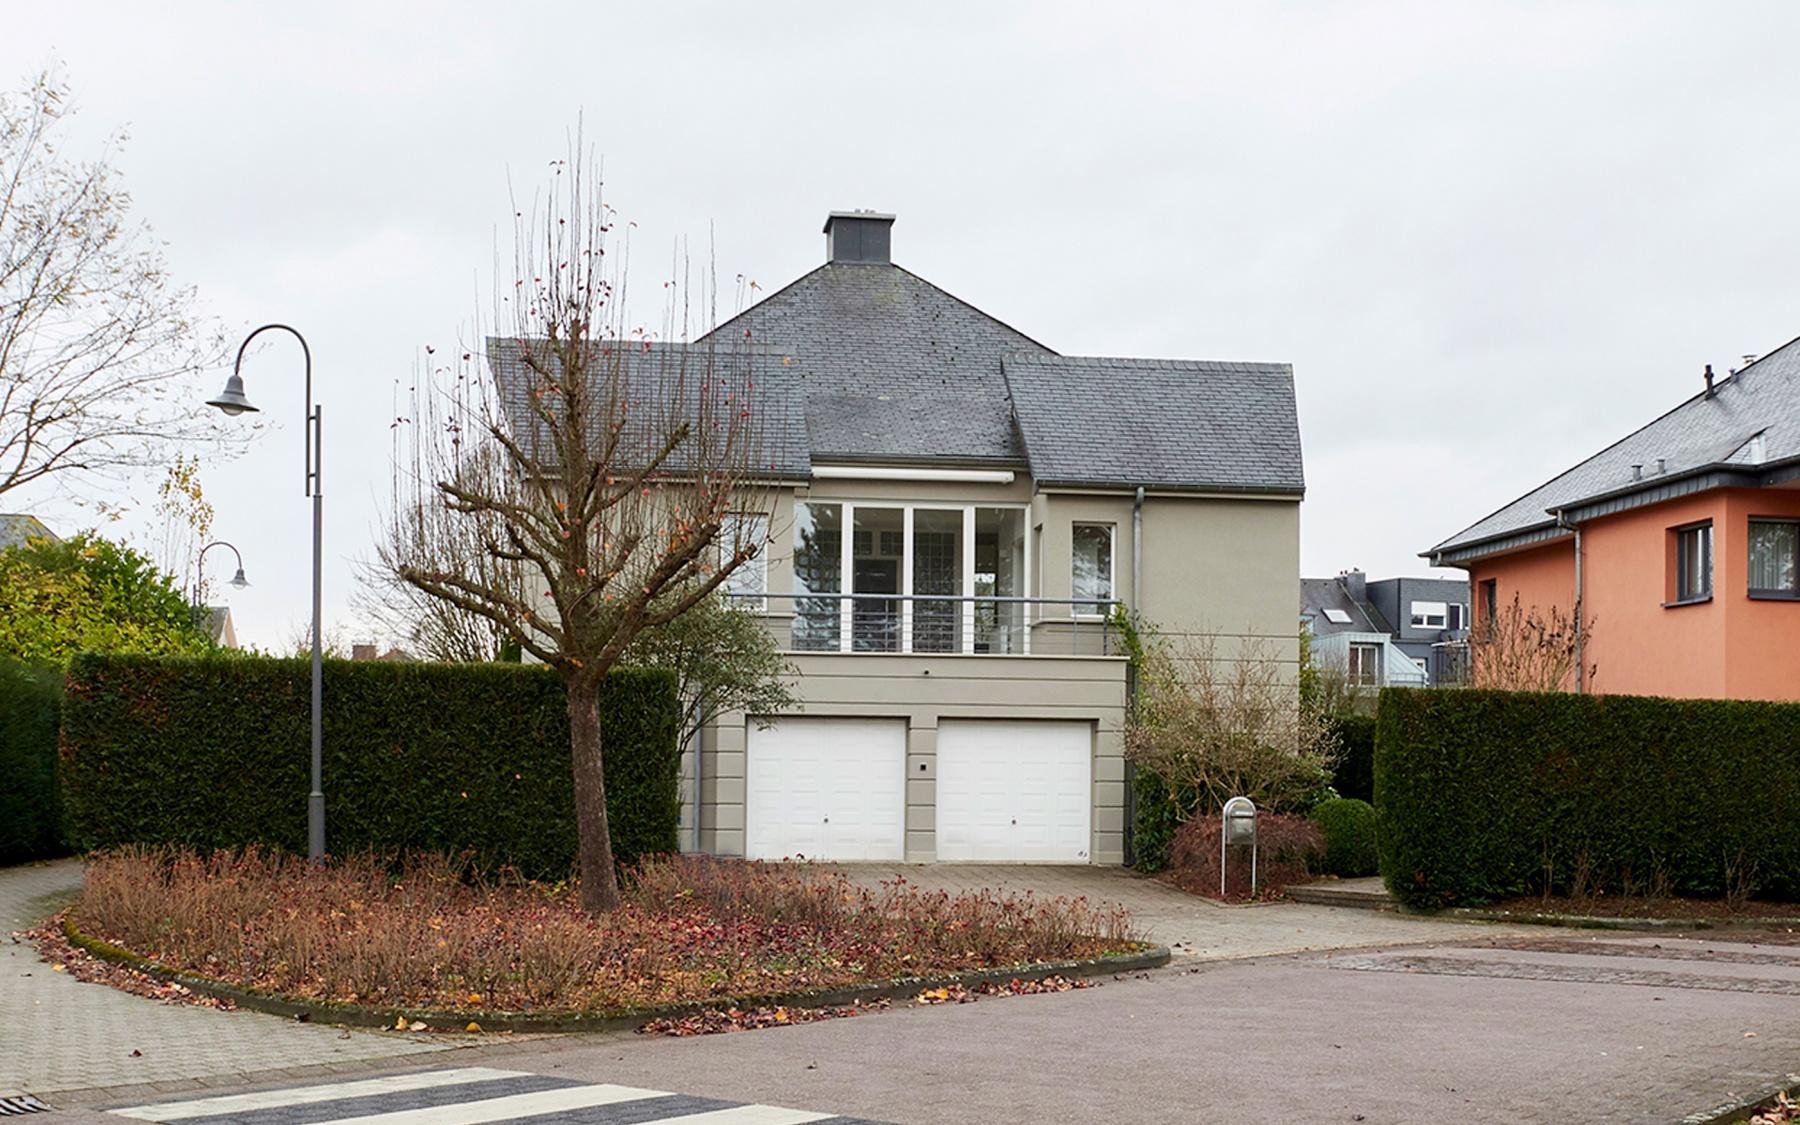 Maison dans la commune de Walferdange